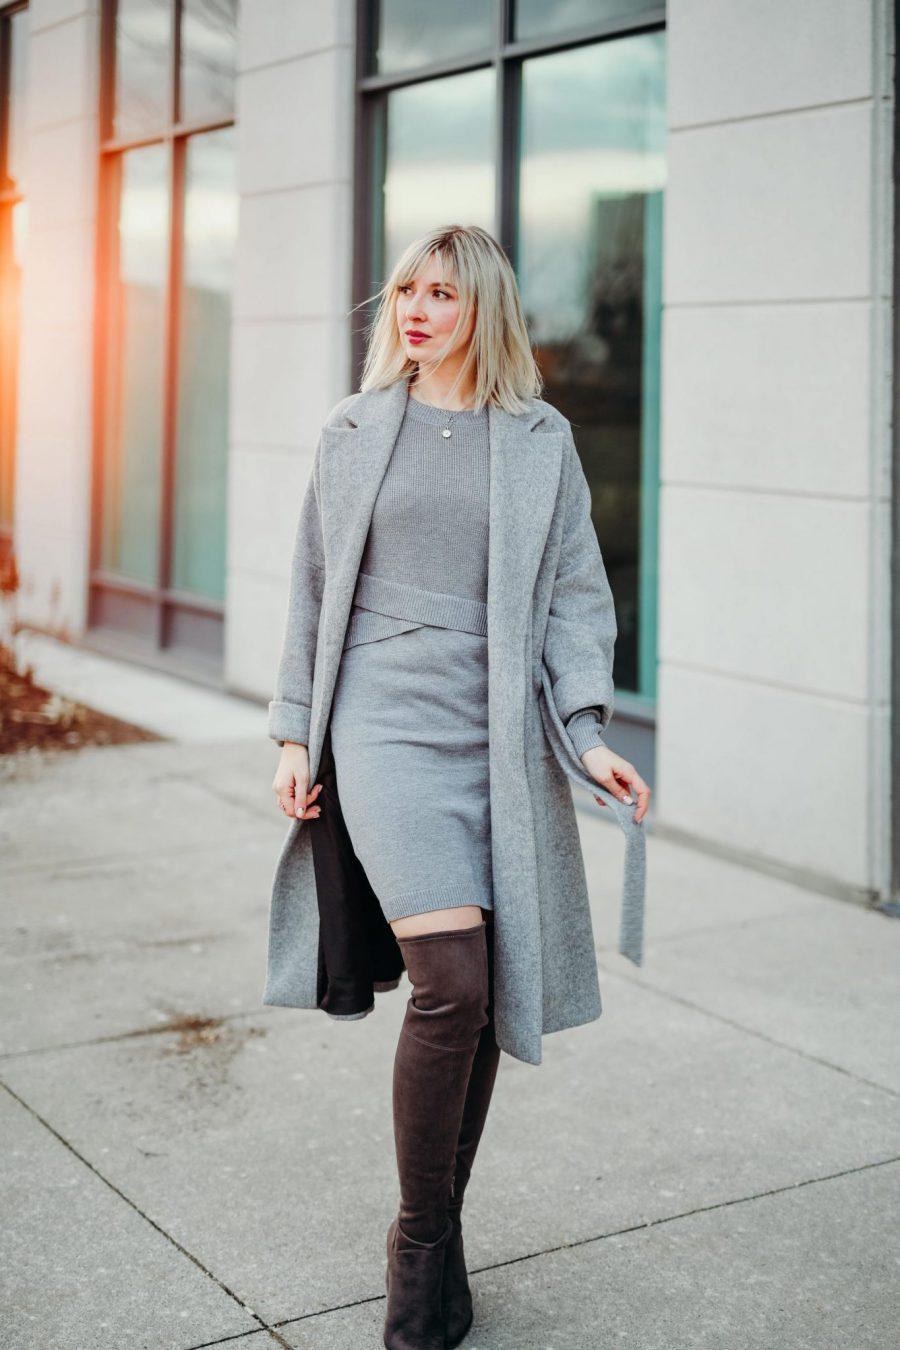 Best Winter Coats For Women 2020-2021